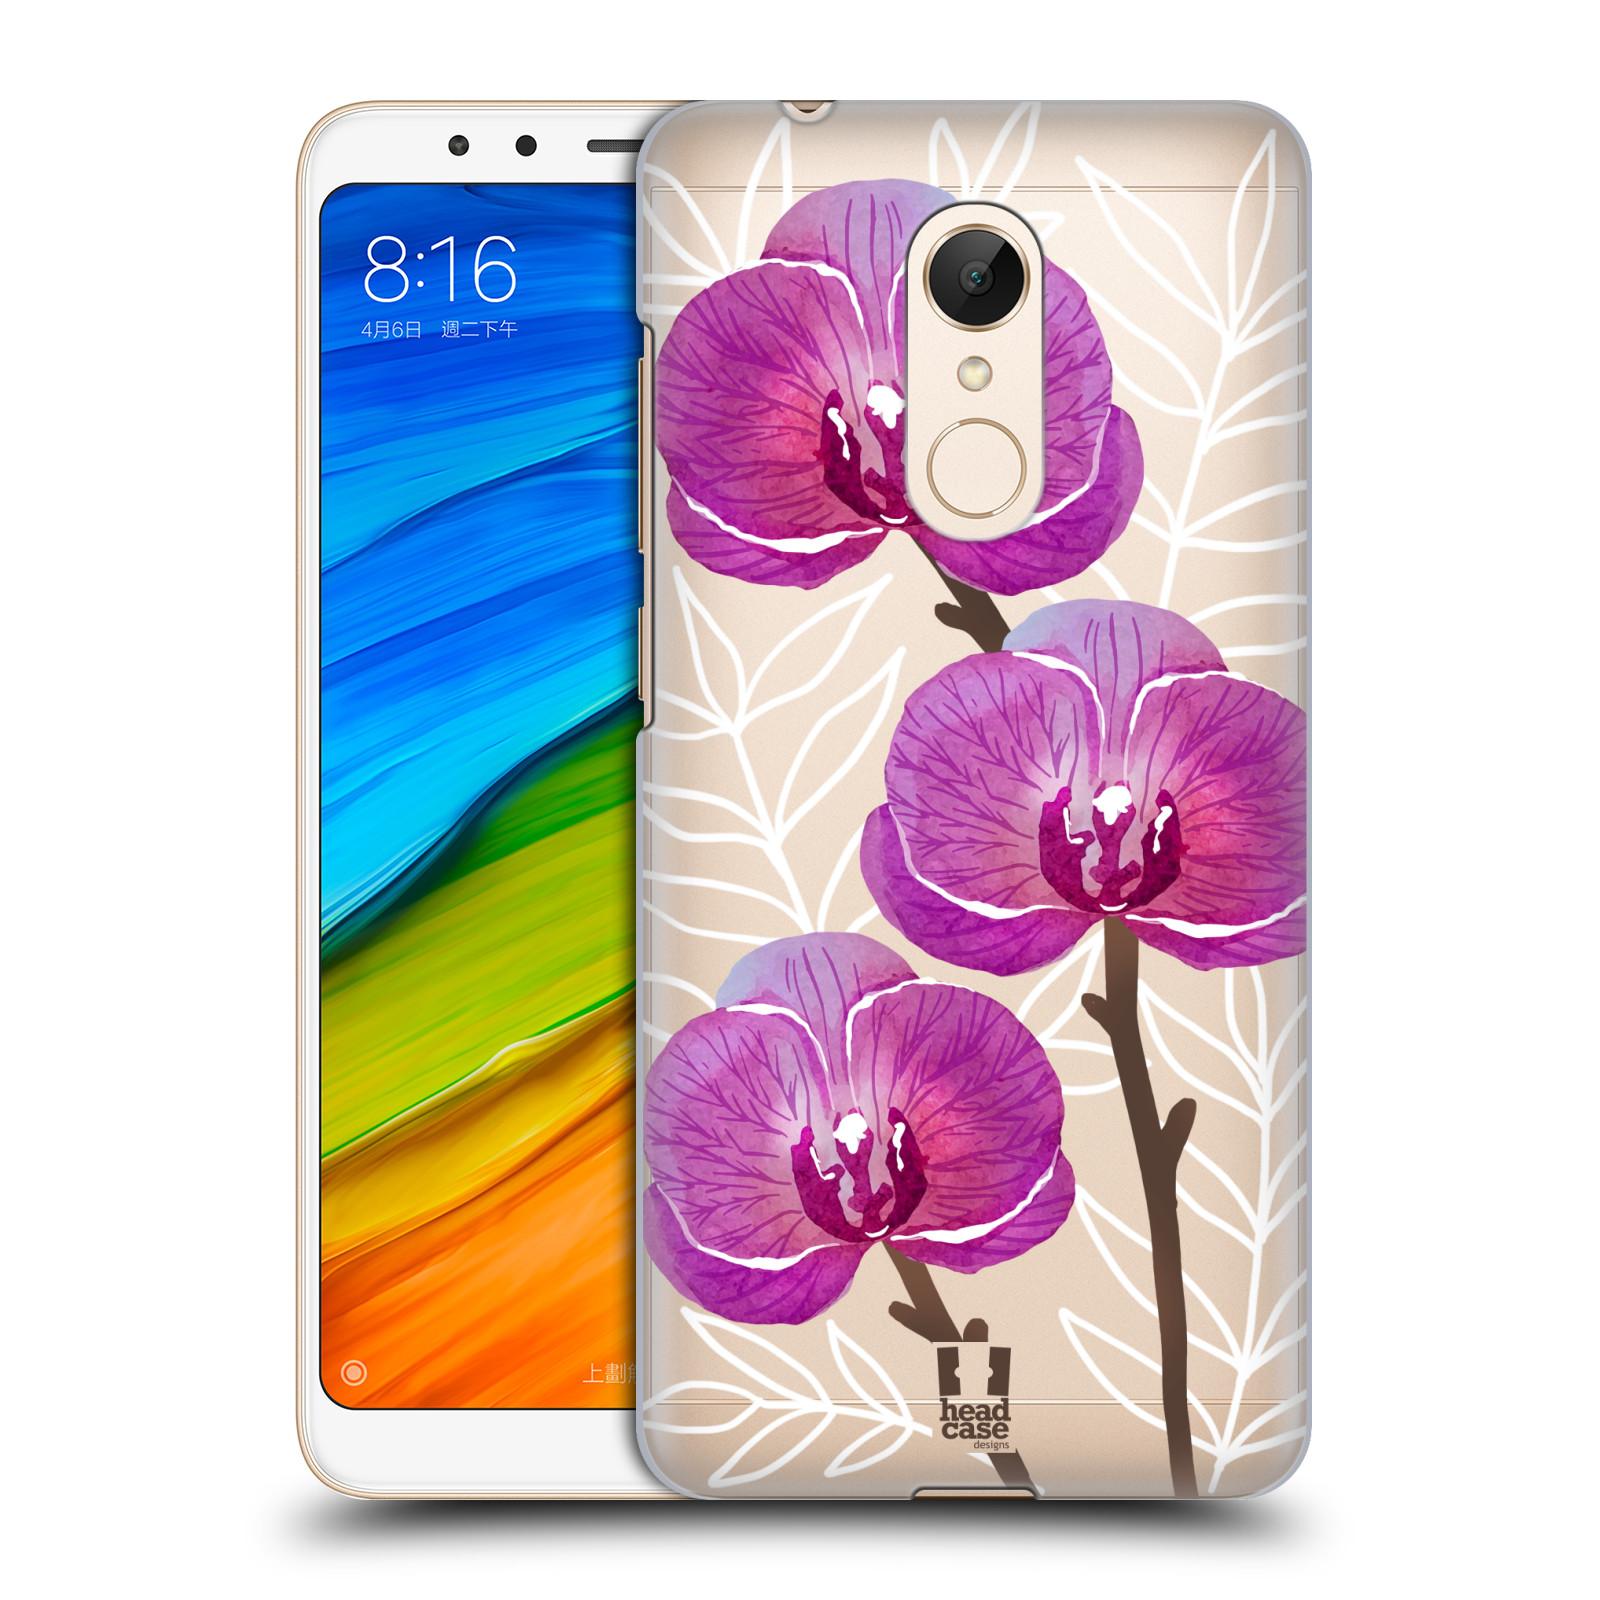 Plastové pouzdro na mobil Xiaomi Redmi 5 - Head Case - Hezoučké kvítky - průhledné